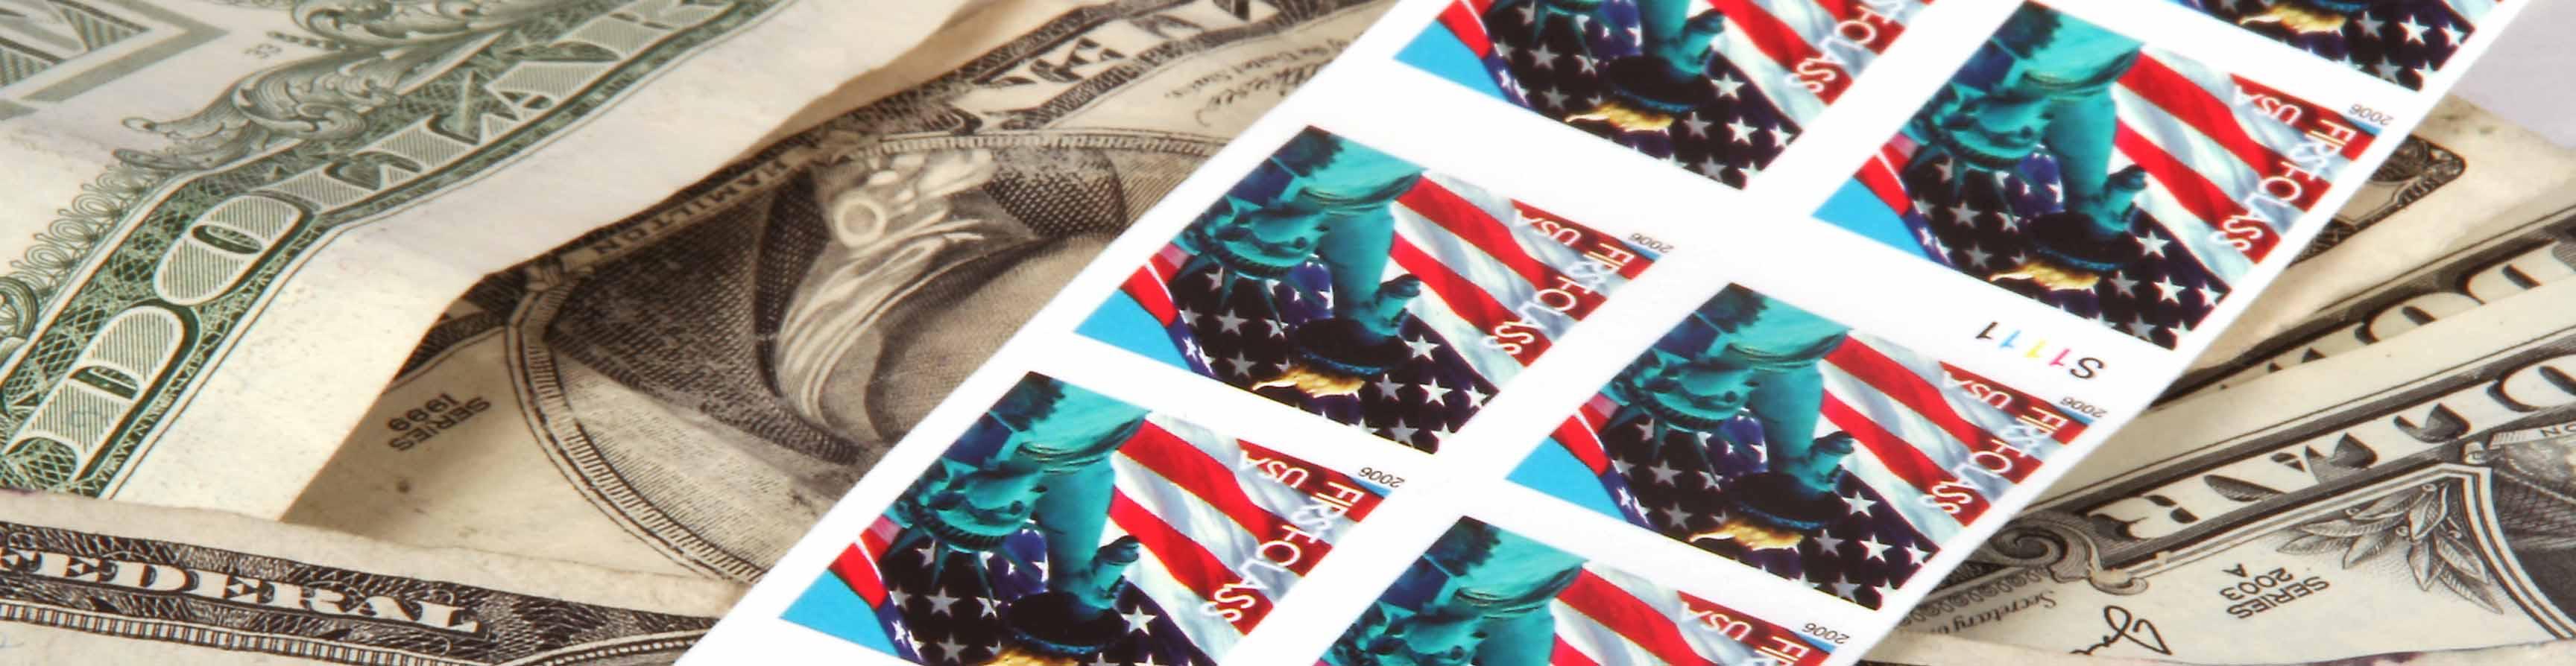 postage_stamps.jpg